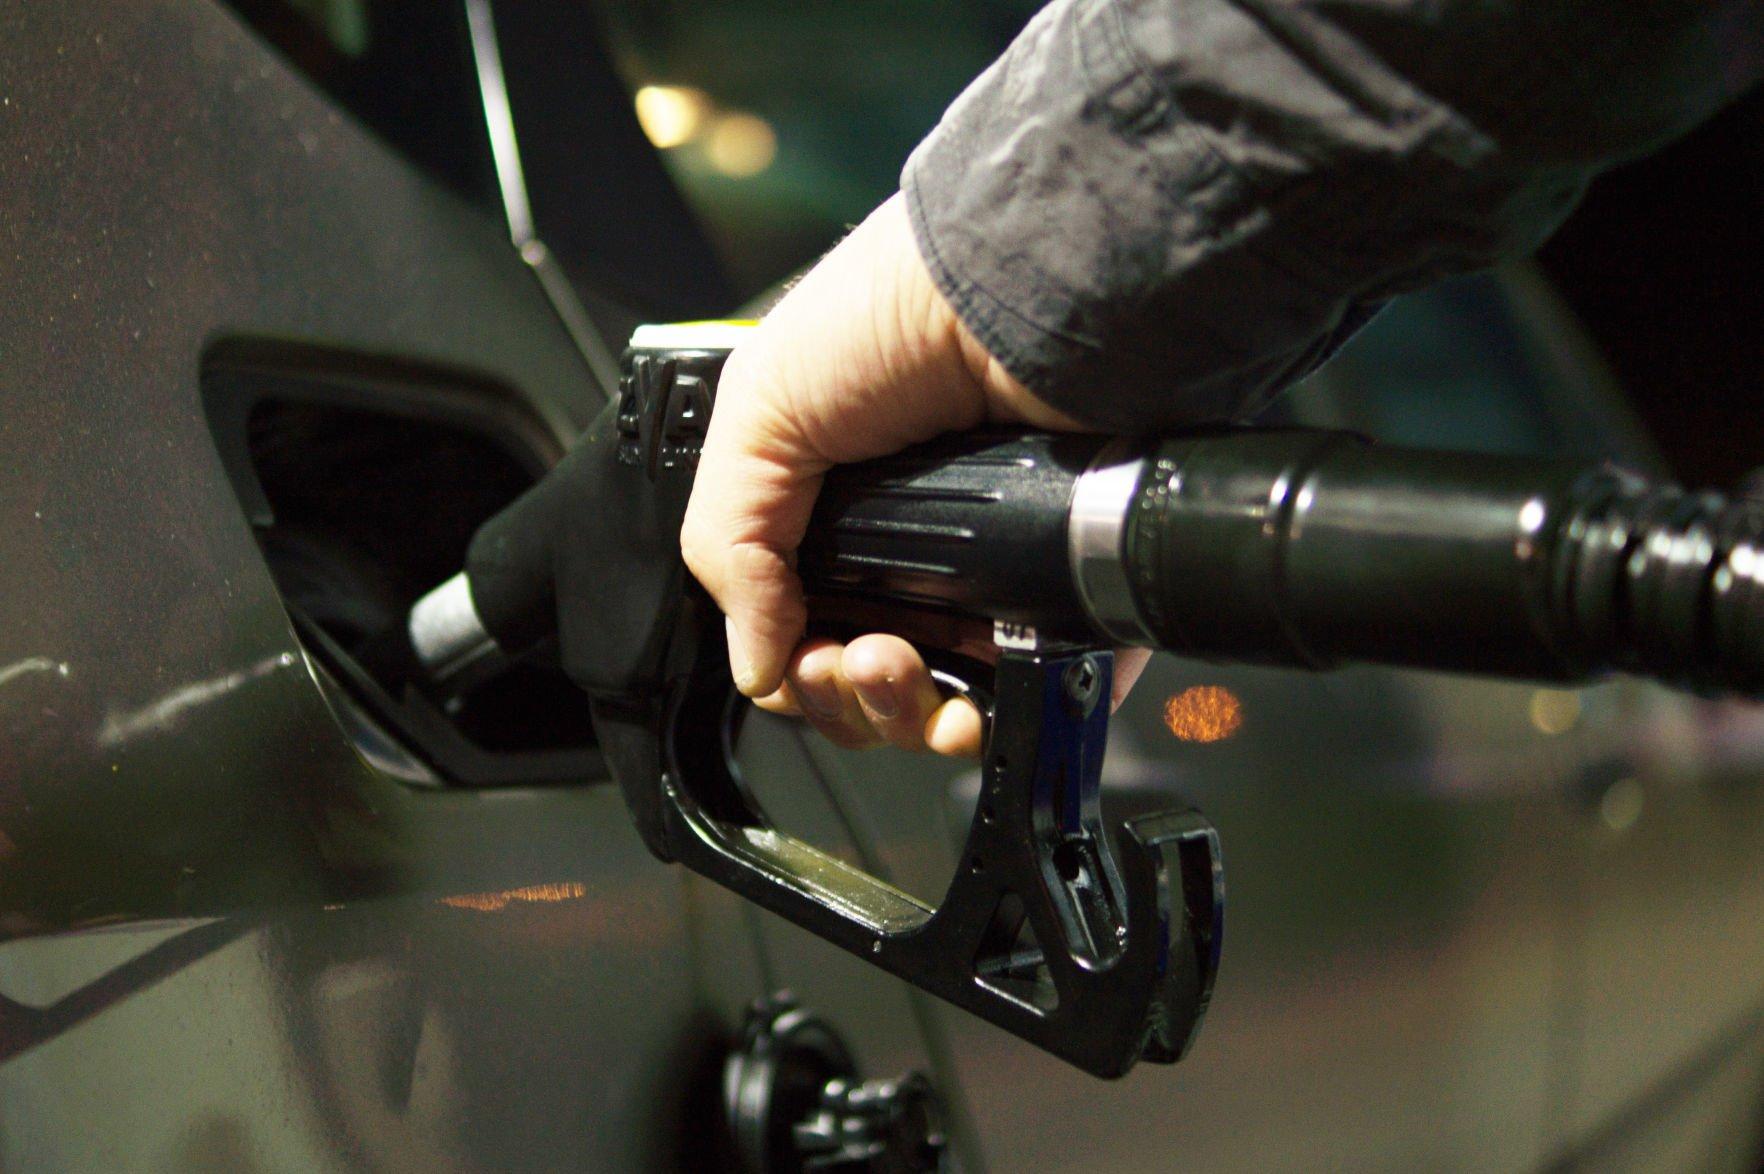 Ada, Canyon gas prices at $3.14 per gallon average, while statewide sits at $3.03 | Idaho Press